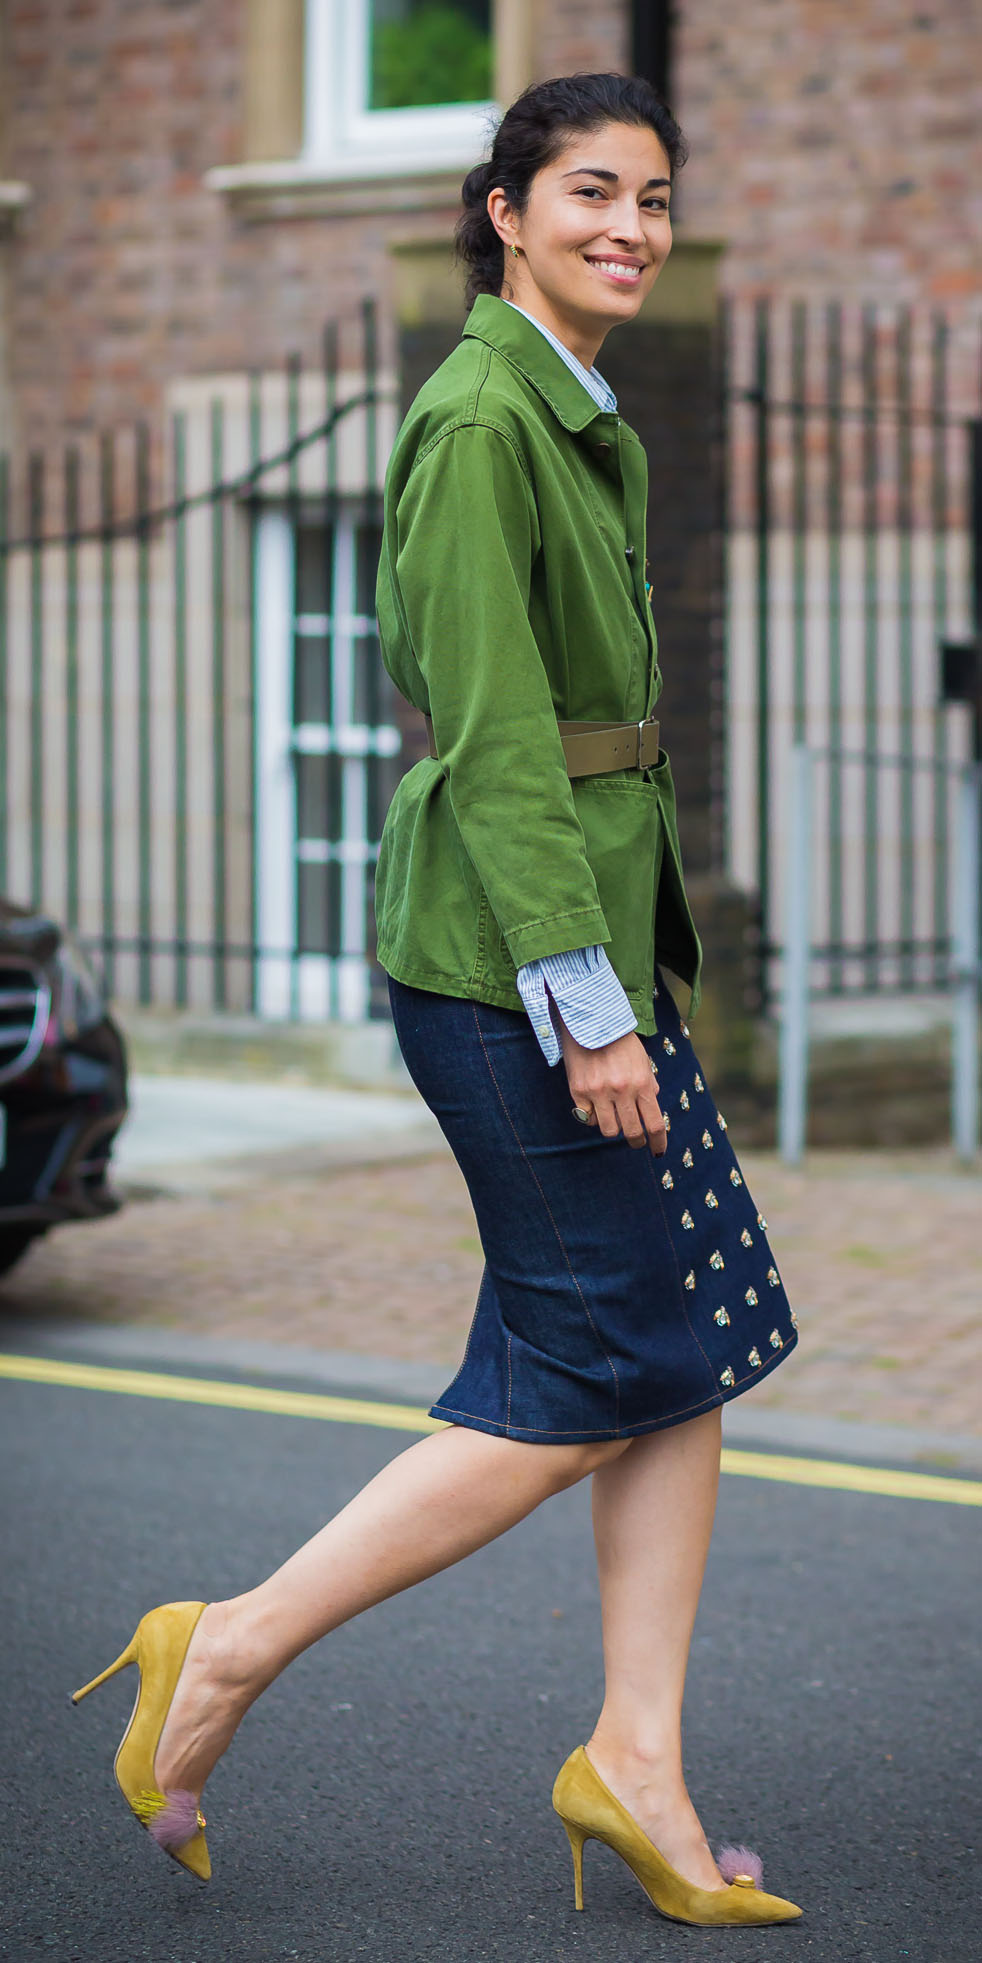 blue-navy-pencil-skirt-denim-green-emerald-jacket-utility-yellow-shoe-pumps-pony-blue-light-collared-shirt-spring-summer-brun-lunch.jpg